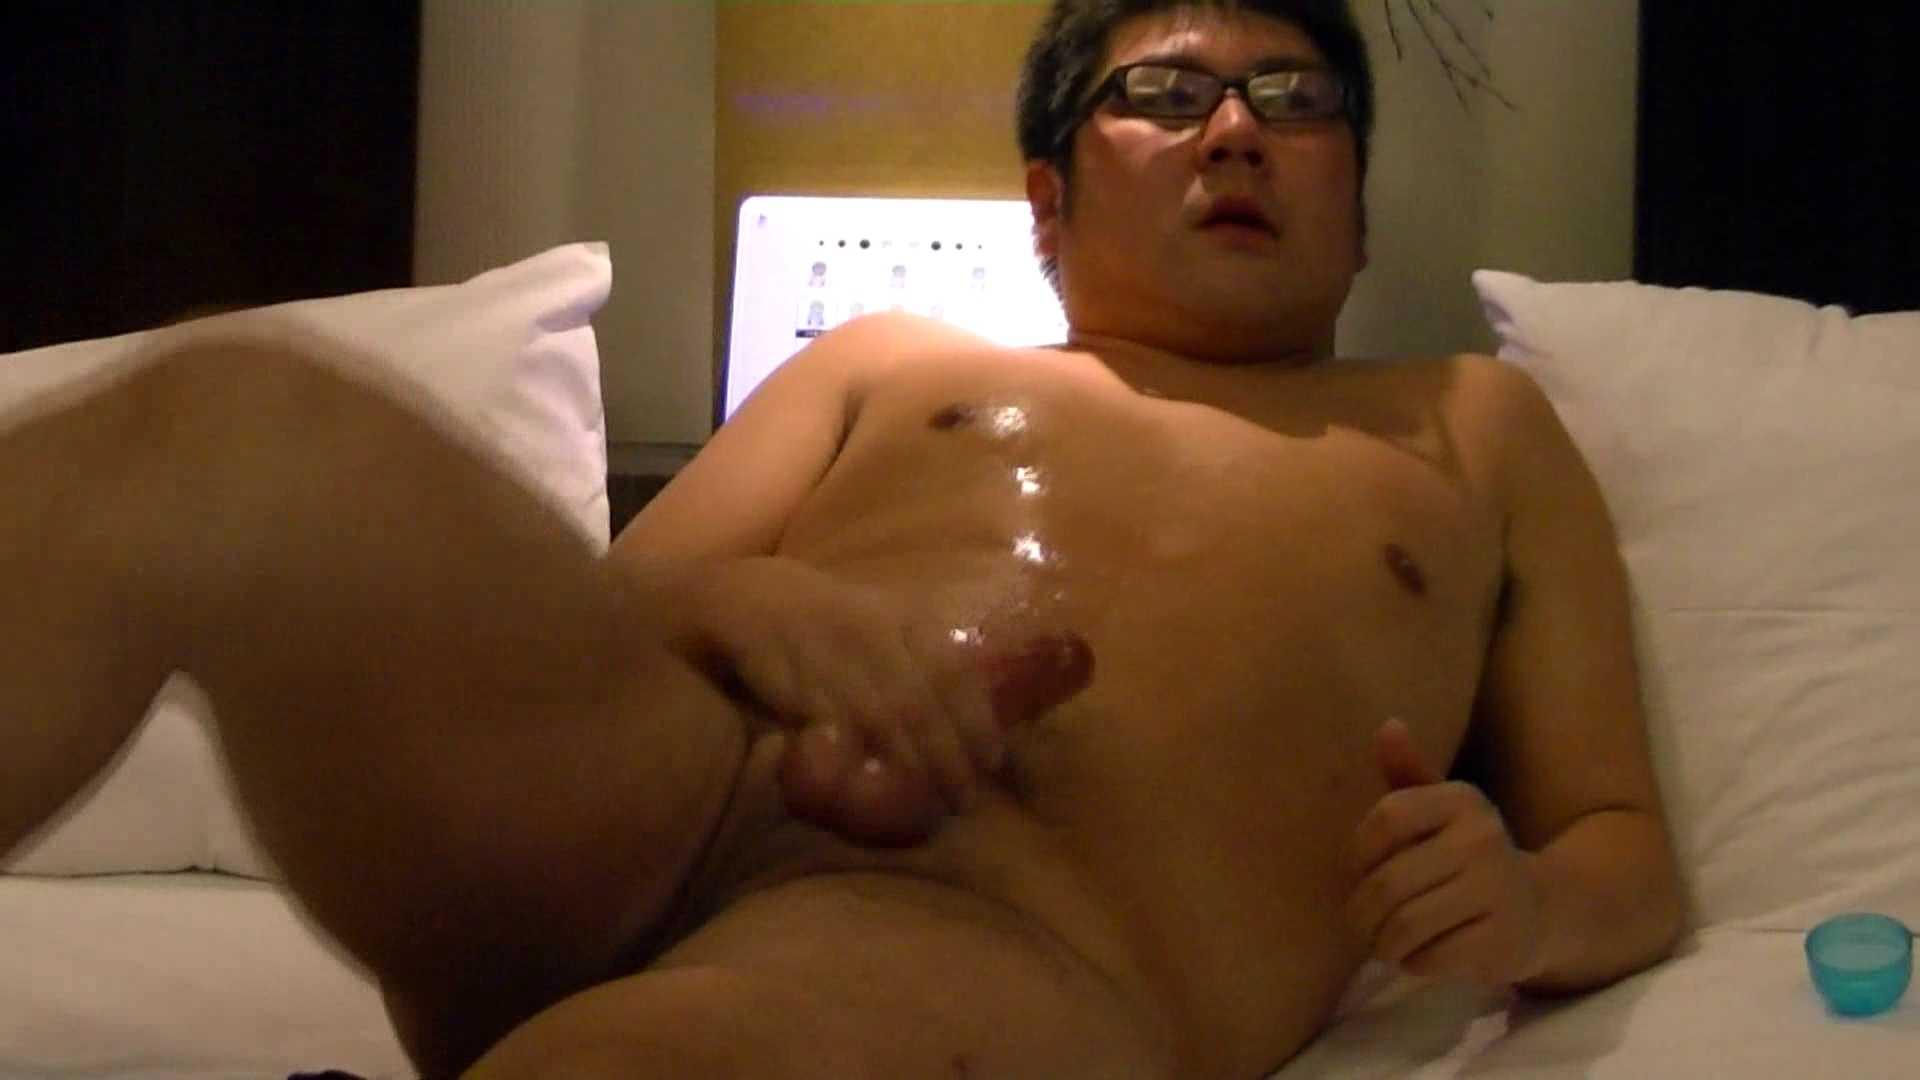 Mr.オナックスさん投稿!HD 貴方のオナニー三万円で撮影させてください。VOL.03 後編 完全無修正でお届け | オナニー特集  83pic 44